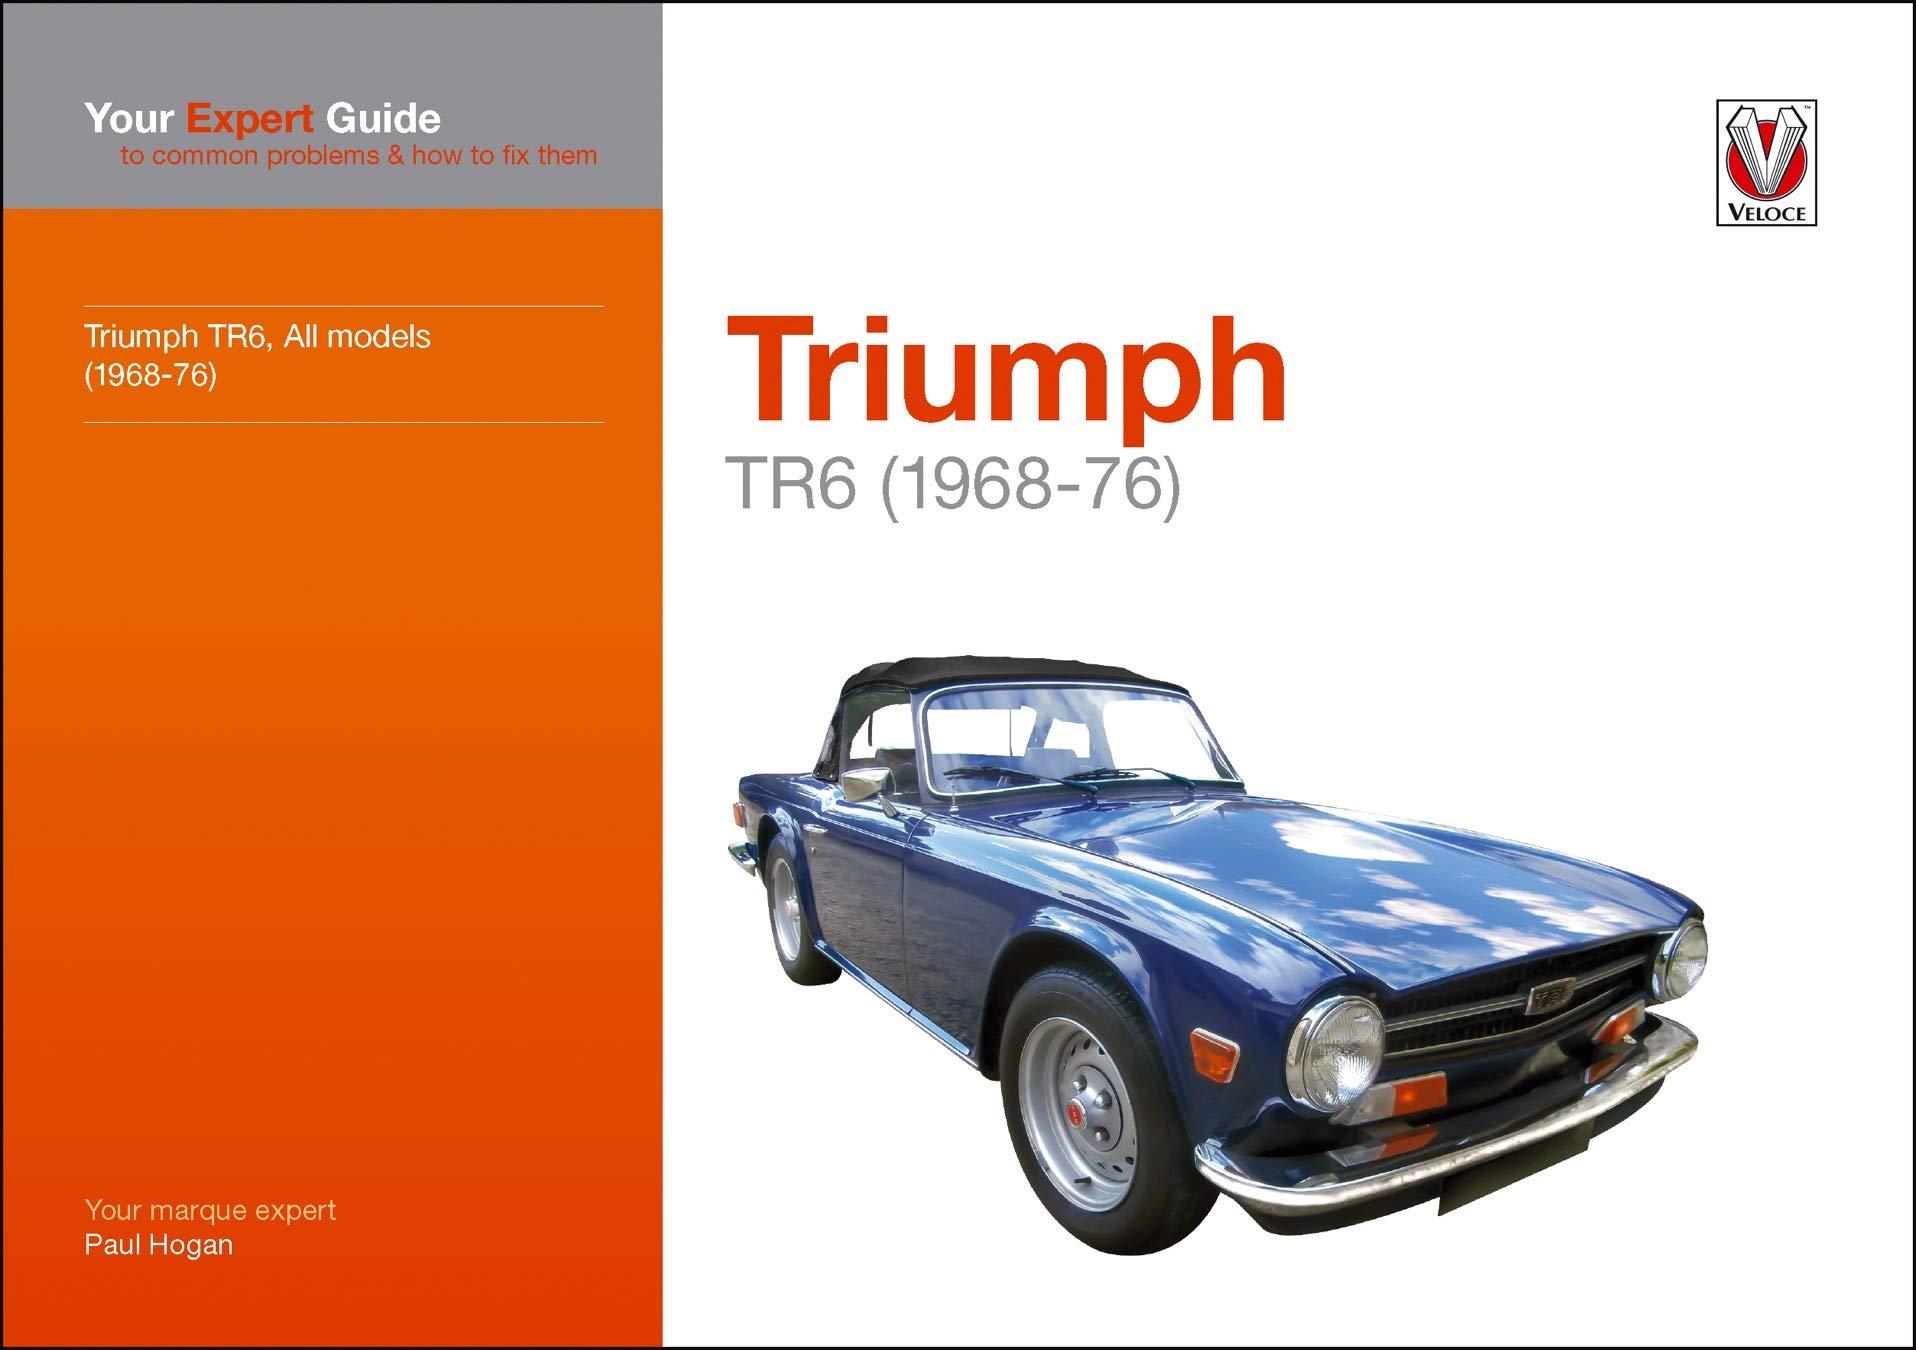 Triumph TR6 expert common problems product image